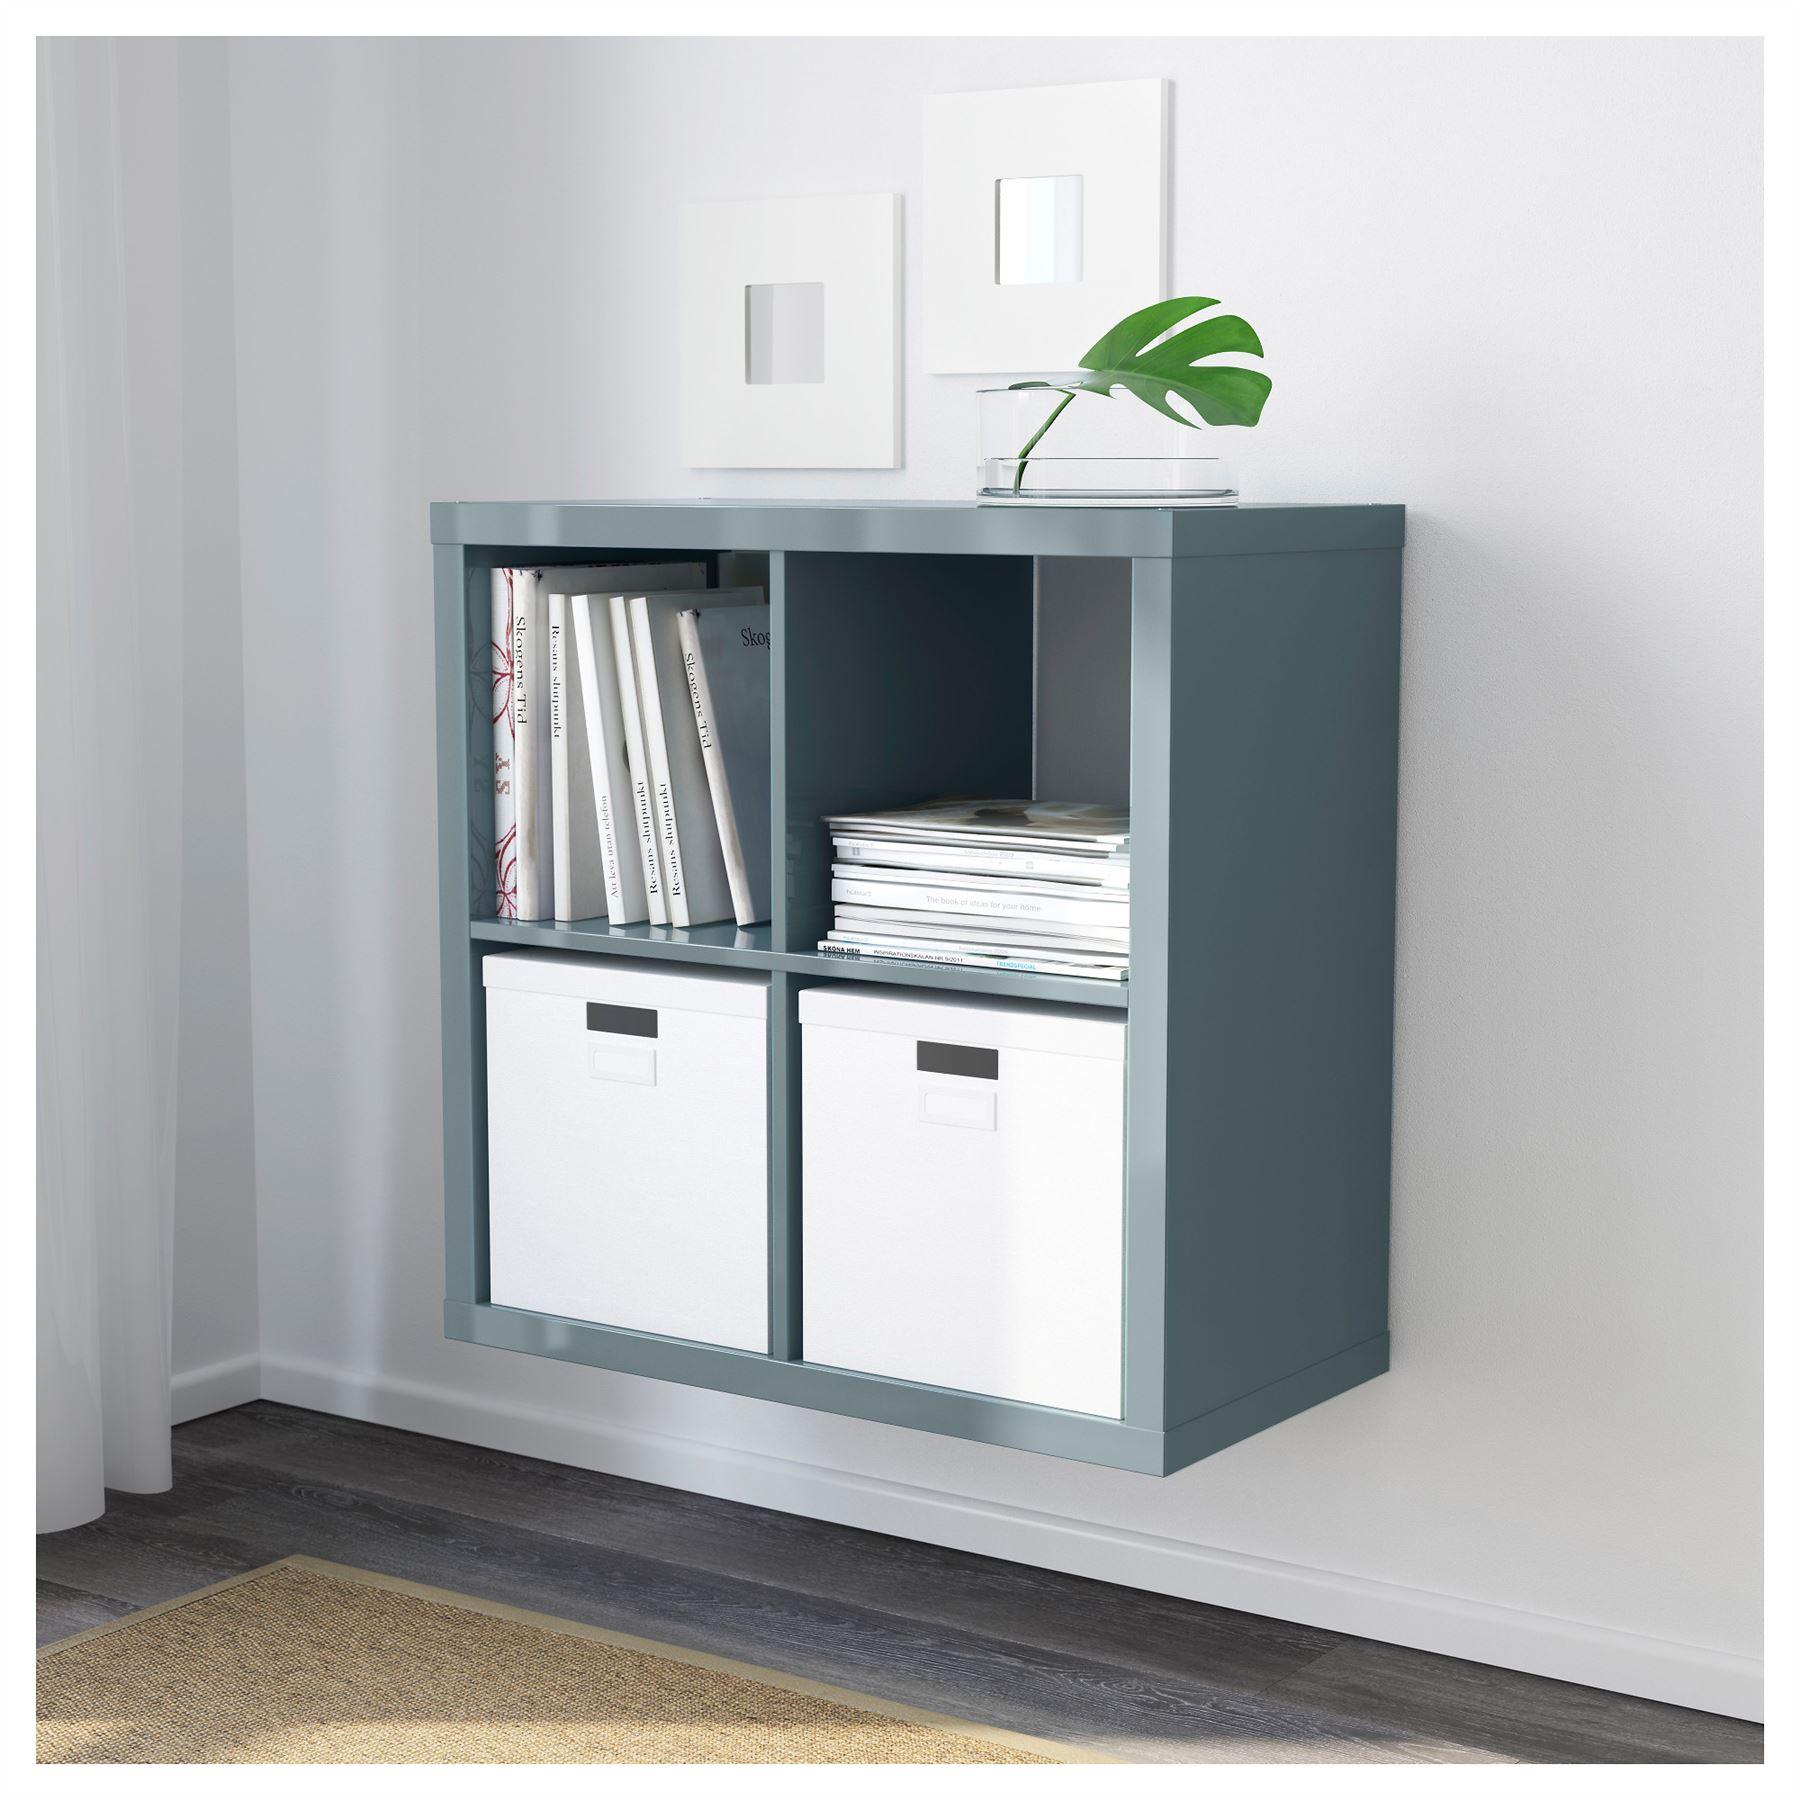 Ikea kallax 4 cube storage bookcase square shelving unit for 4 unit